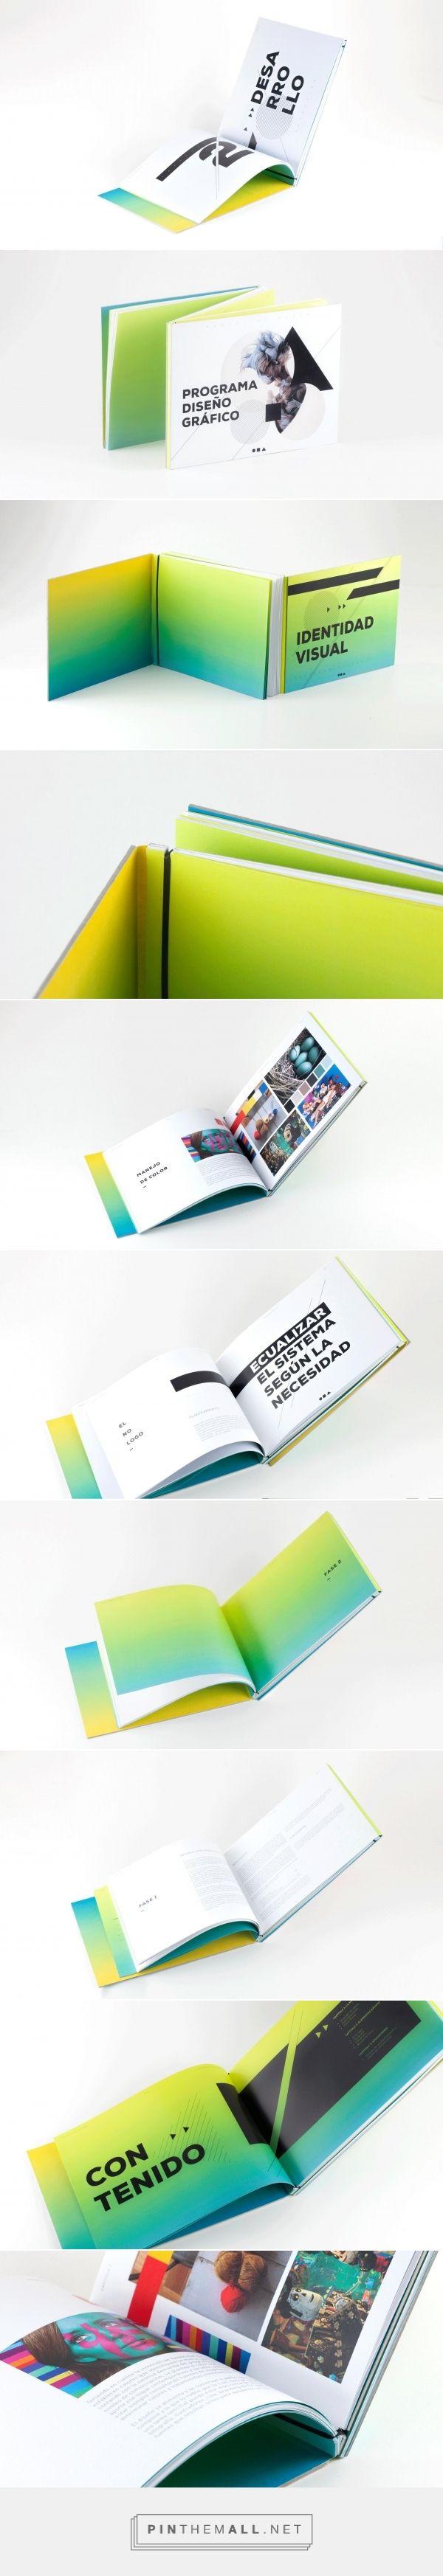 brand book design / identity branding / diseño / color / Design guidelines / visual identity